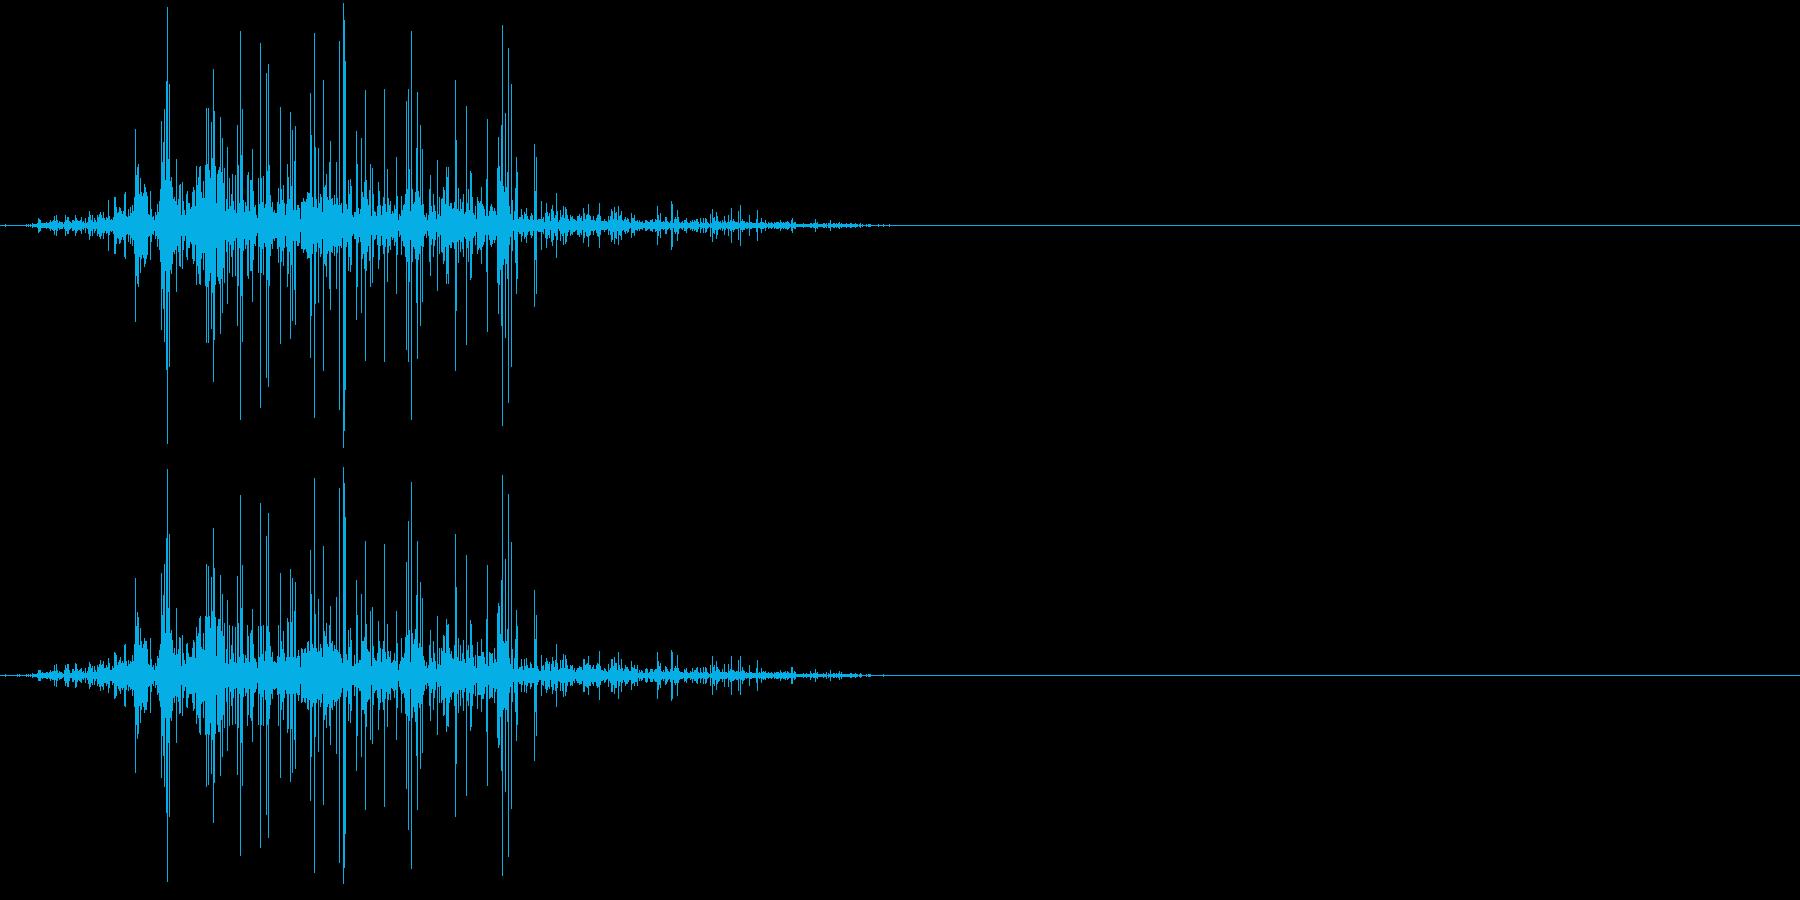 Zombie ゾンビの噛み付き音 1の再生済みの波形